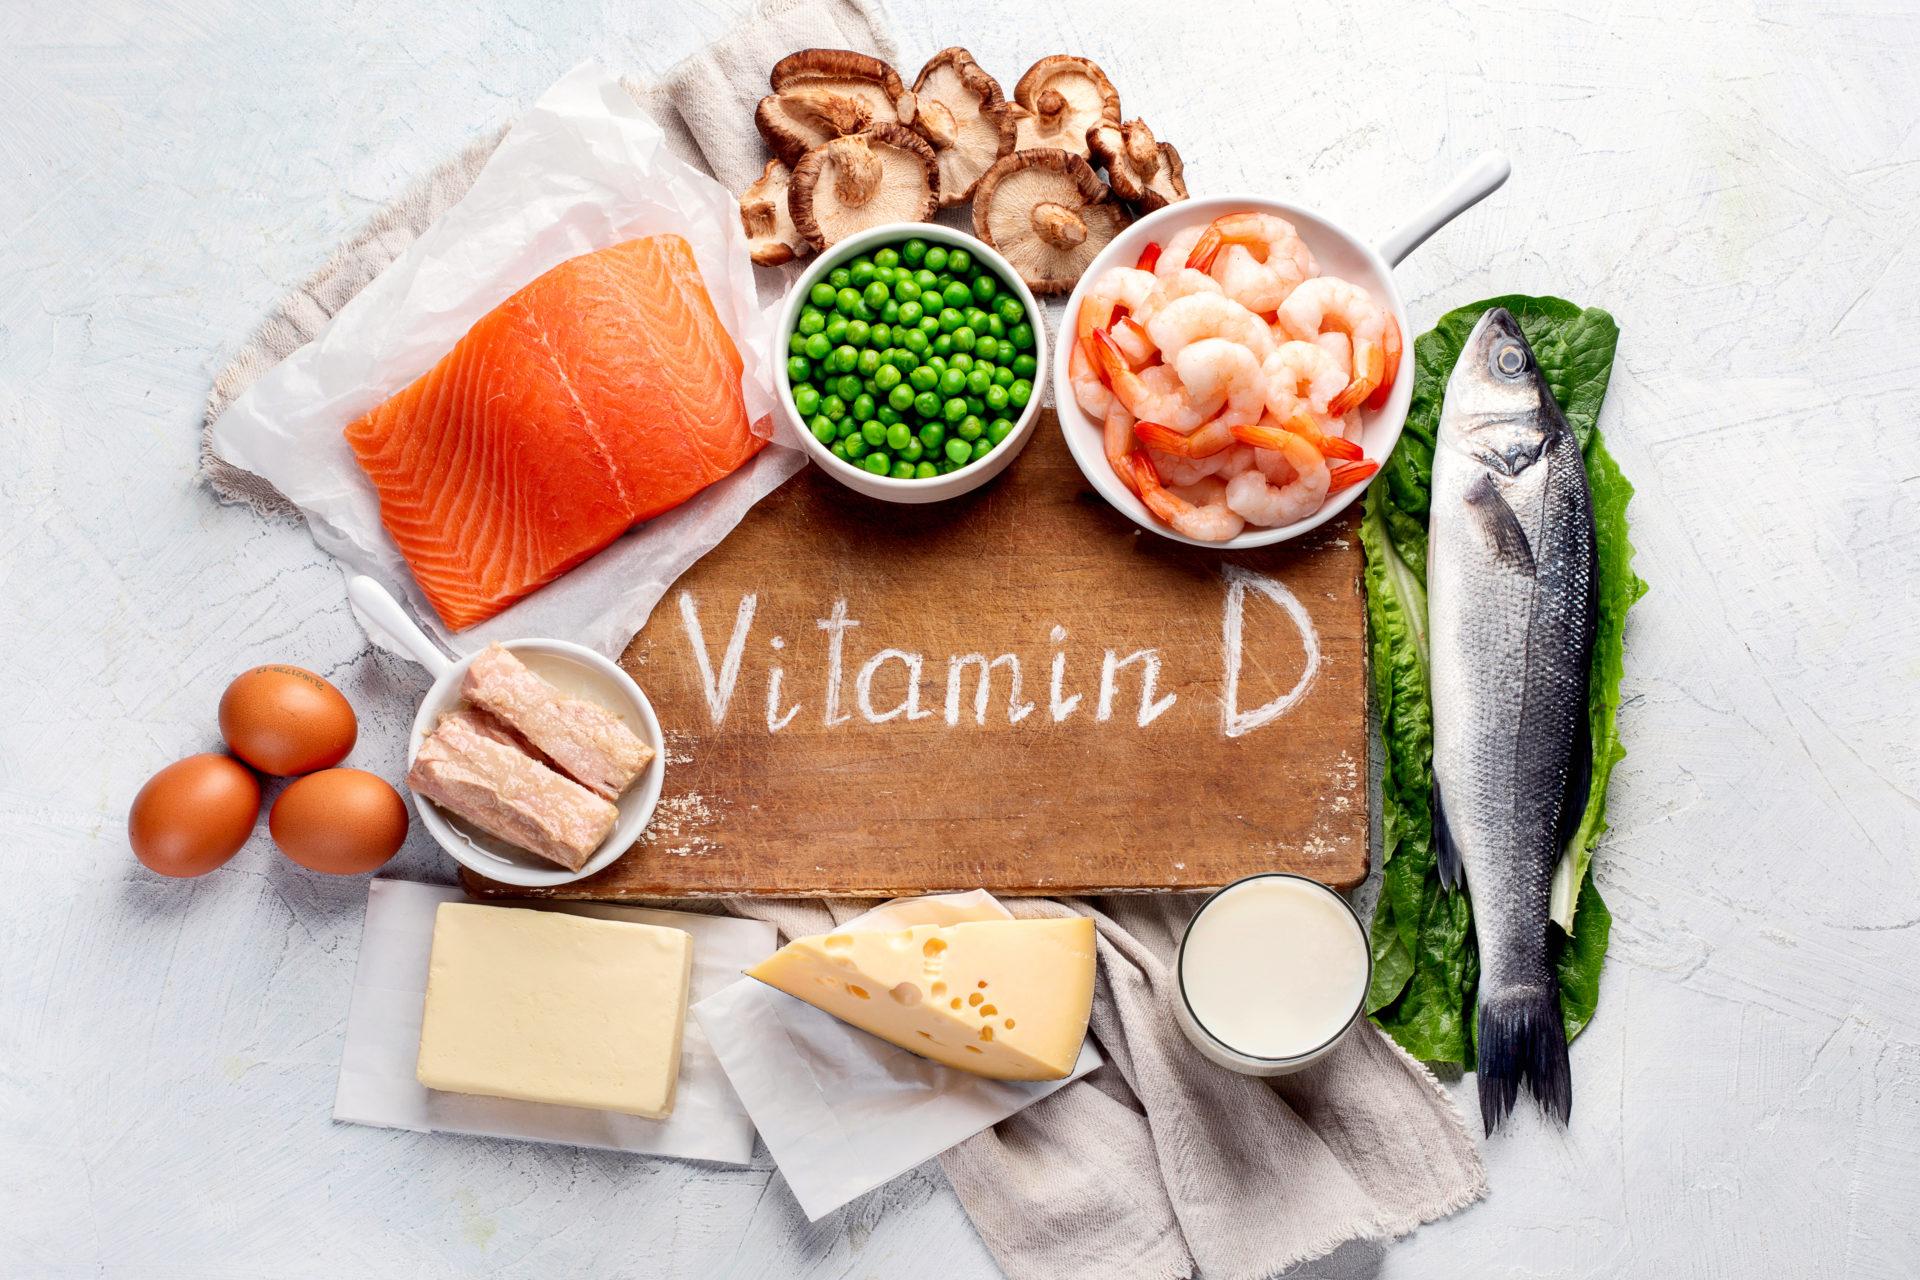 Naturalne źródło witaminy D